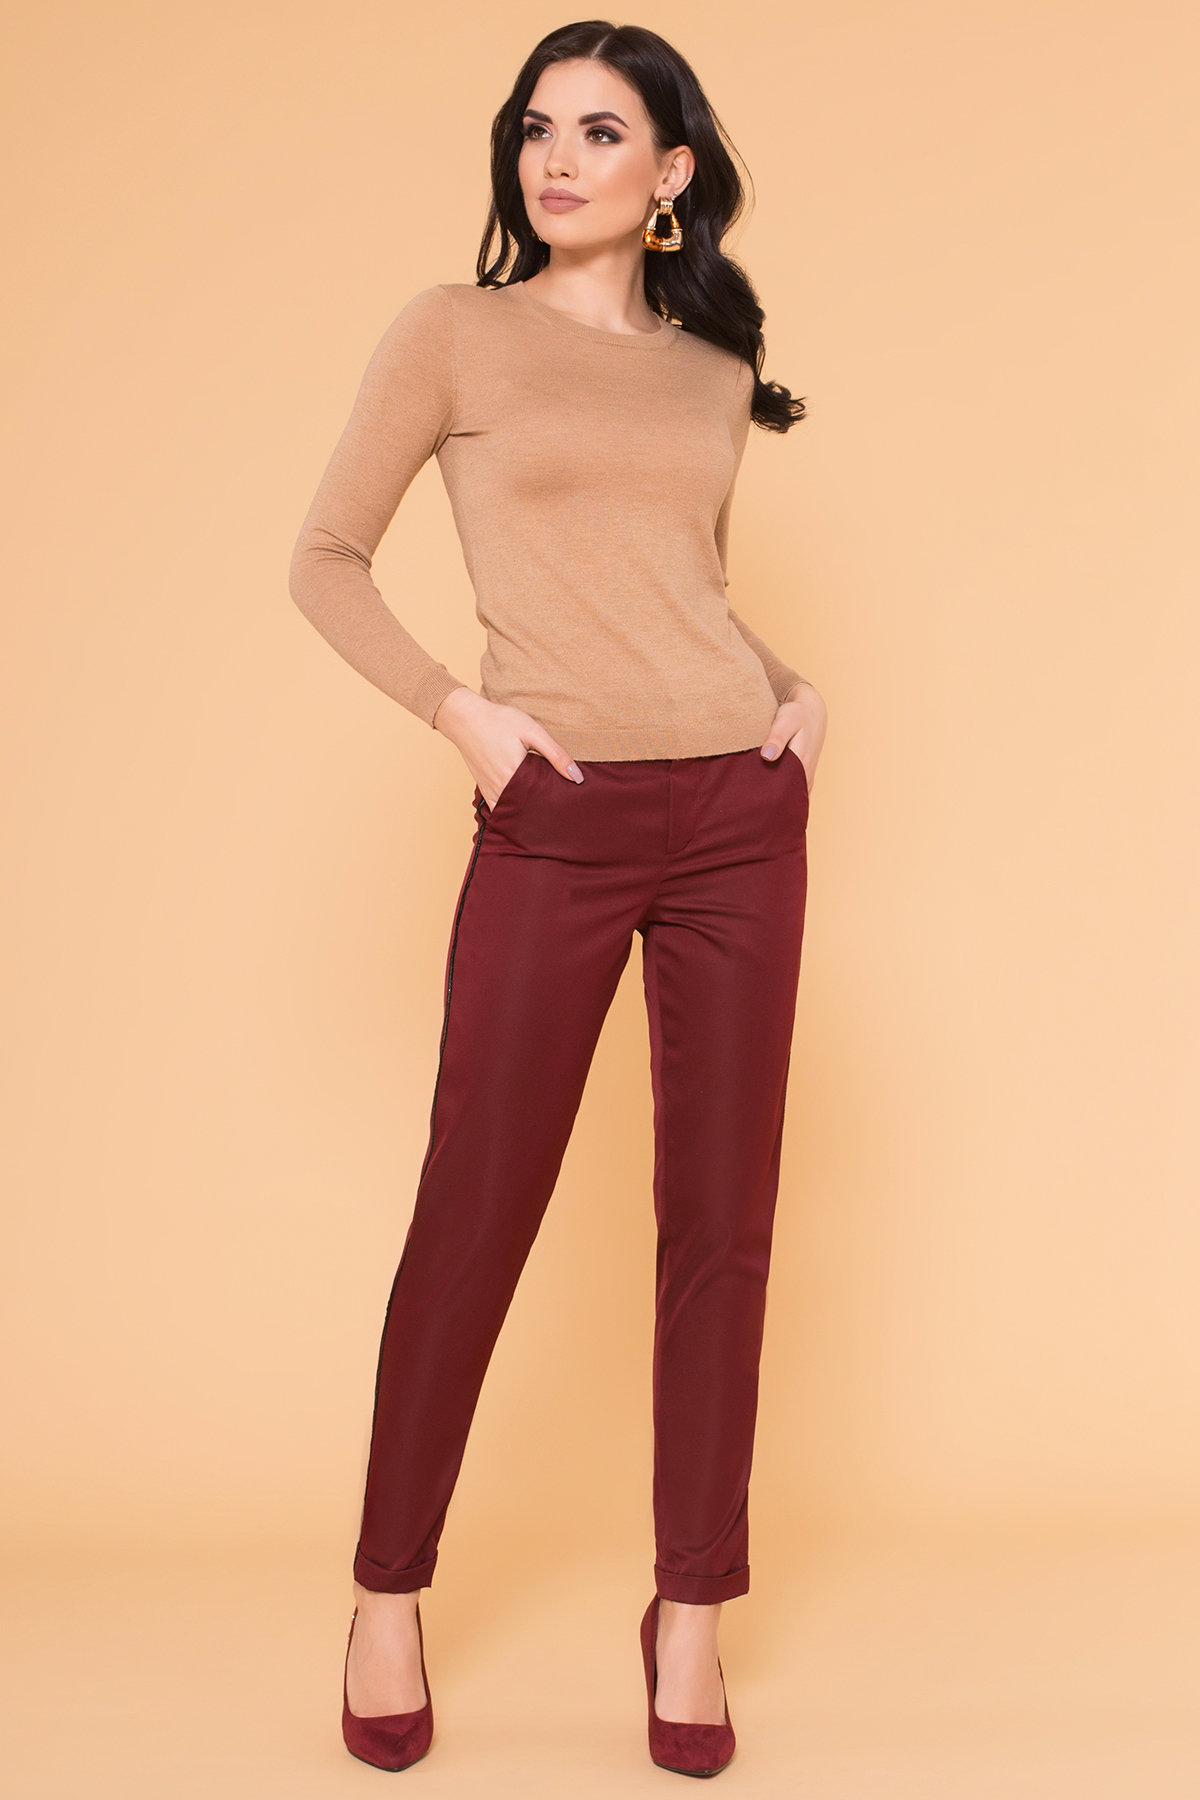 женские брюки от производителя Брюки с ломпасами Стин 5963